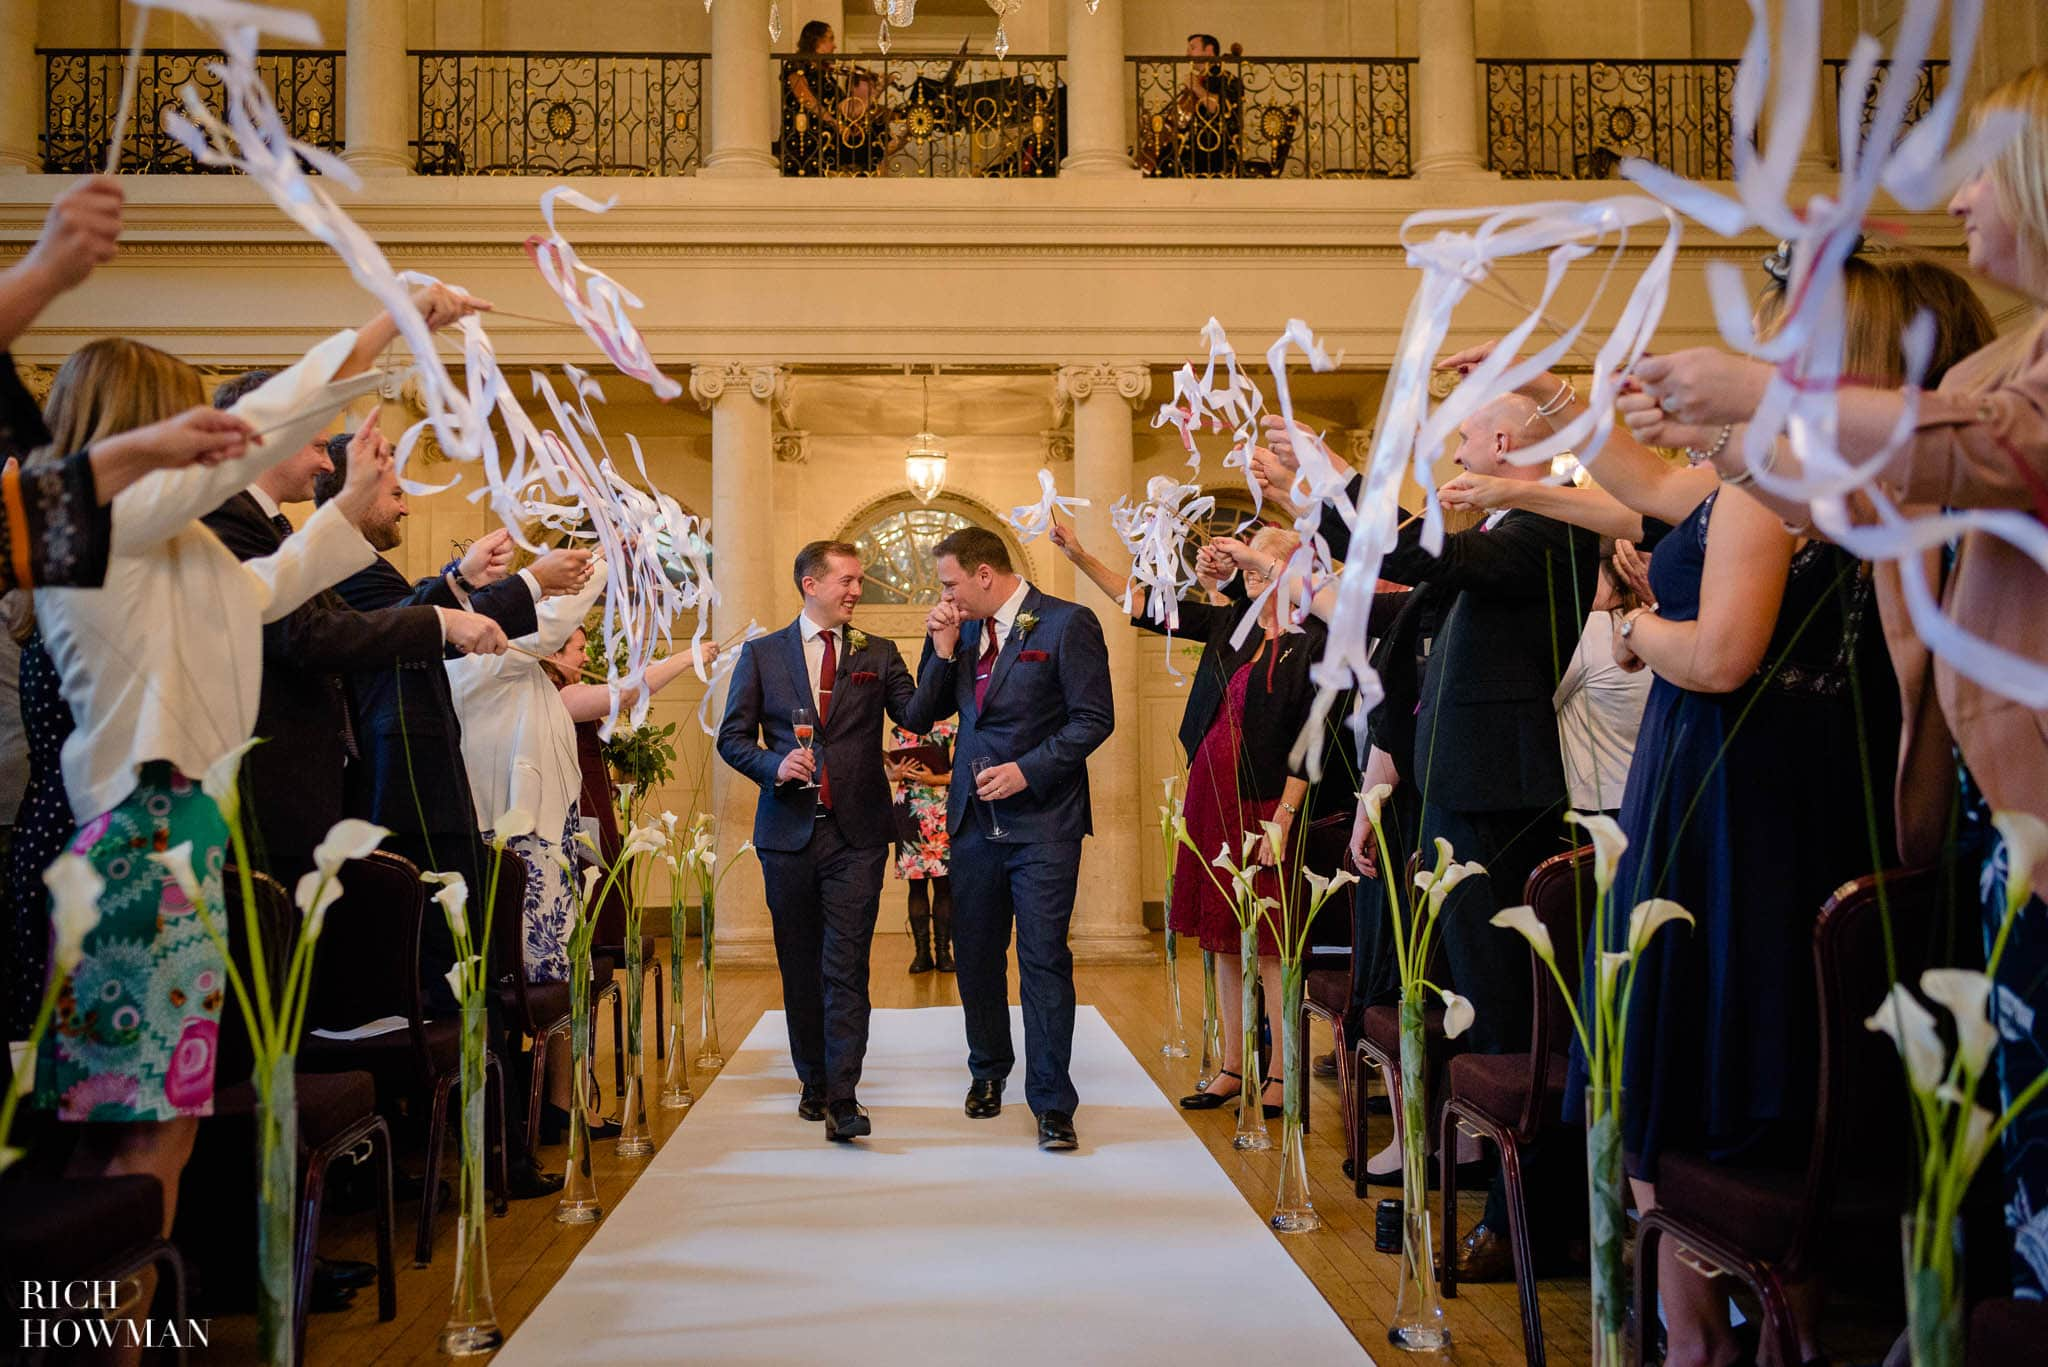 LGBTQ Wedding Photographer - Celebrating PRIDE! 5